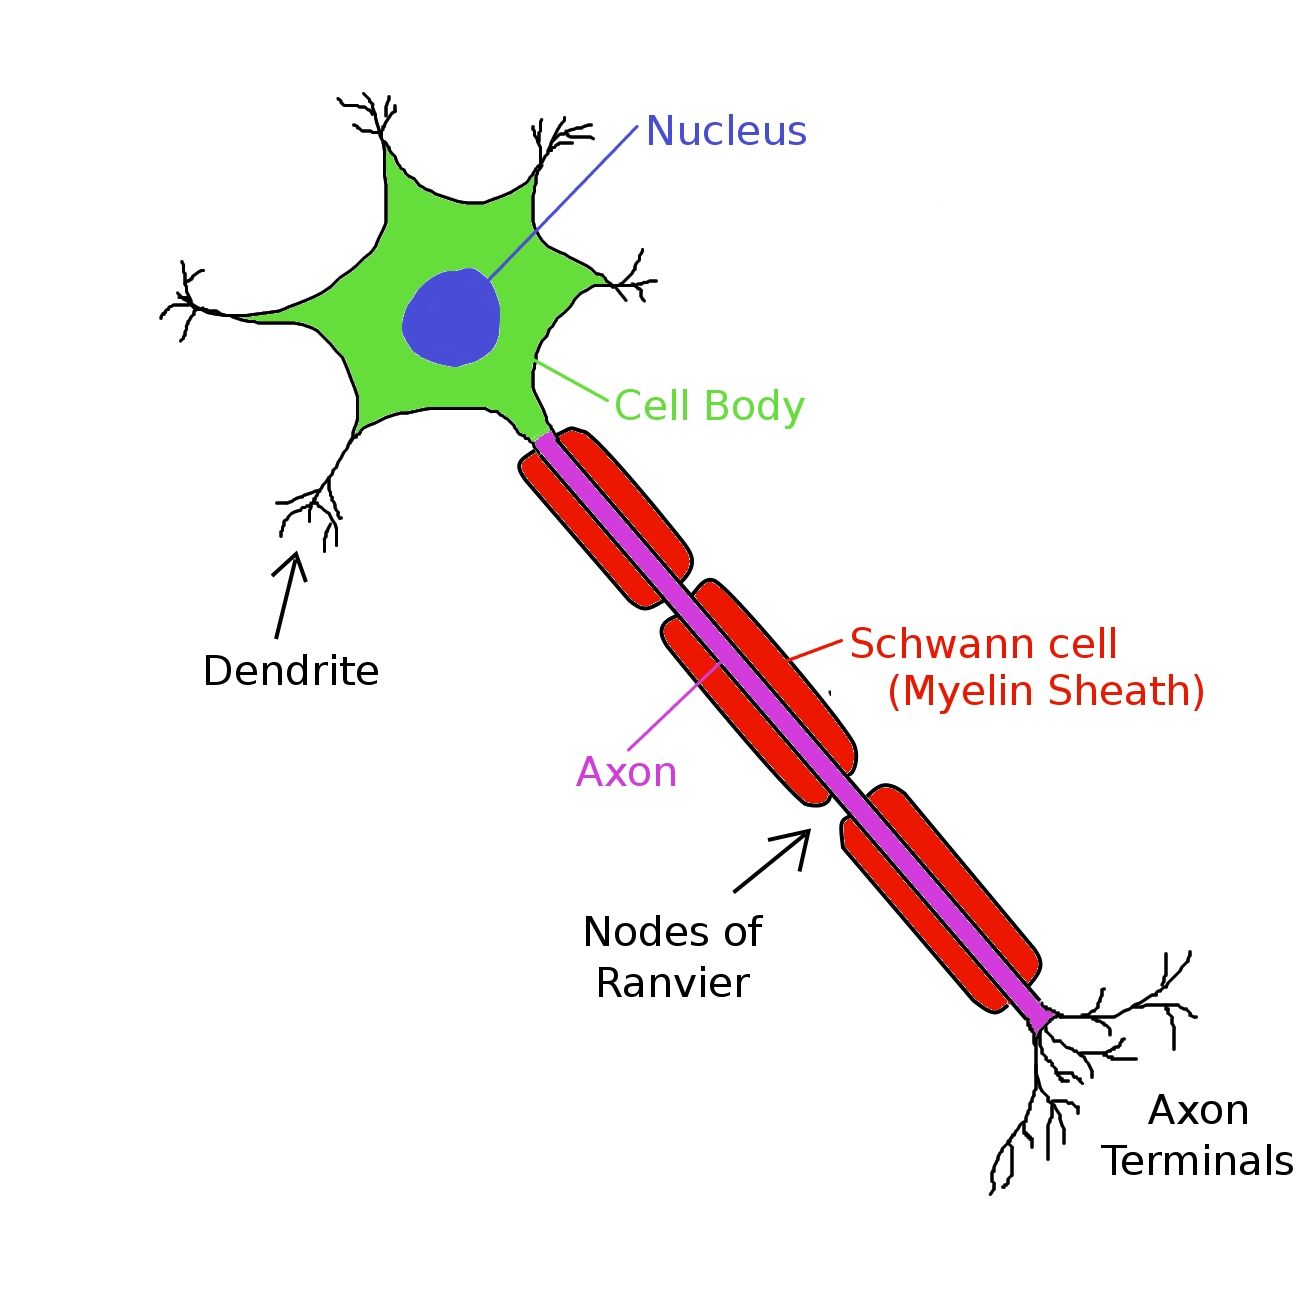 basic neuron diagram 99 chevy tahoe wiring of motor neurone impremedia